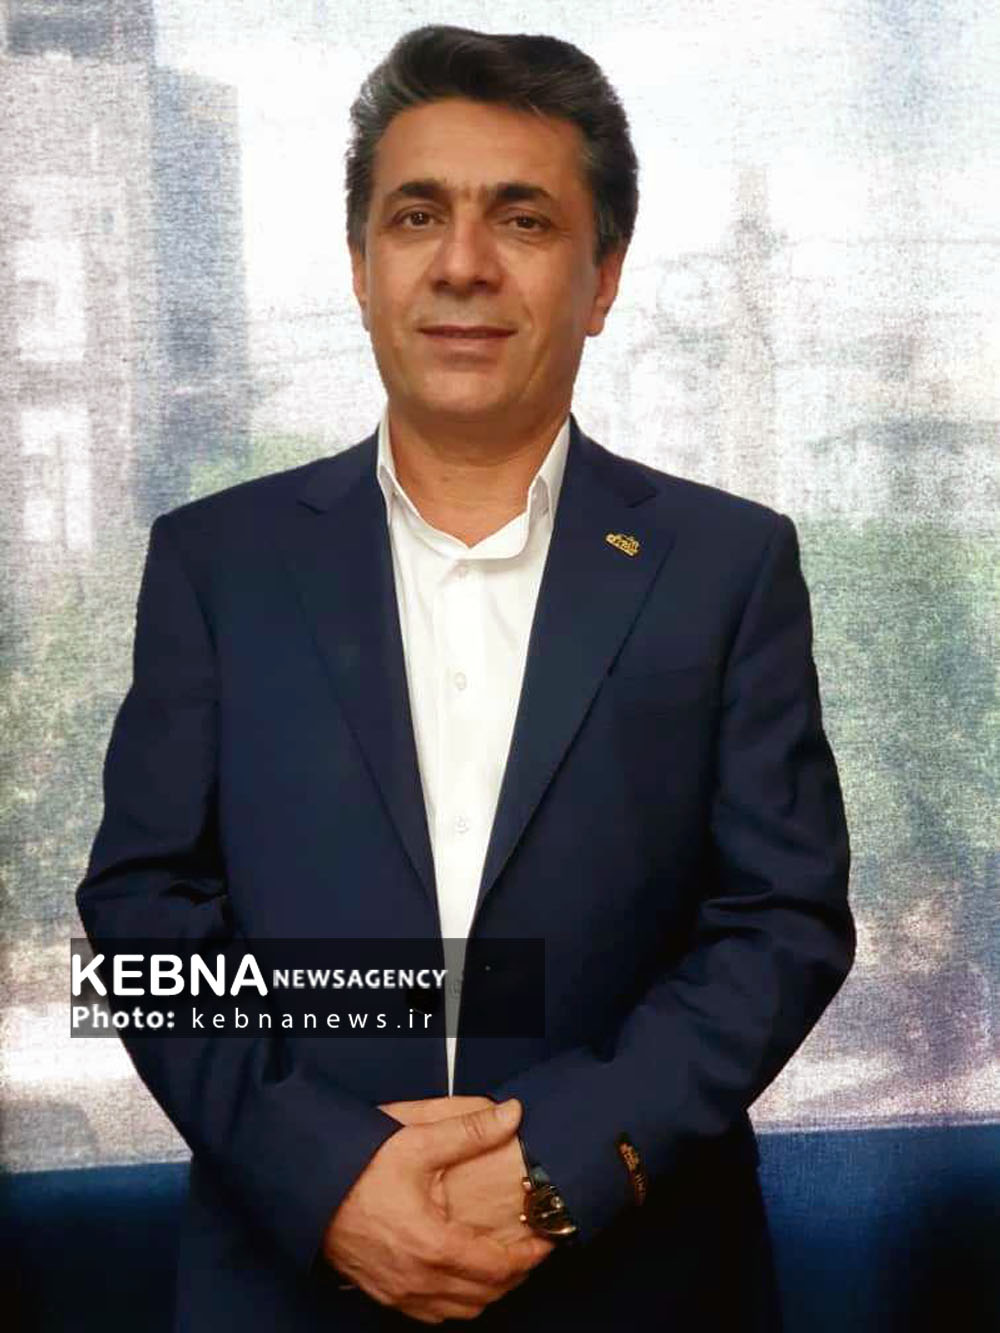 https://www.kebnanews.ir/images/docs/files/000410/nf00410918-1.jpg